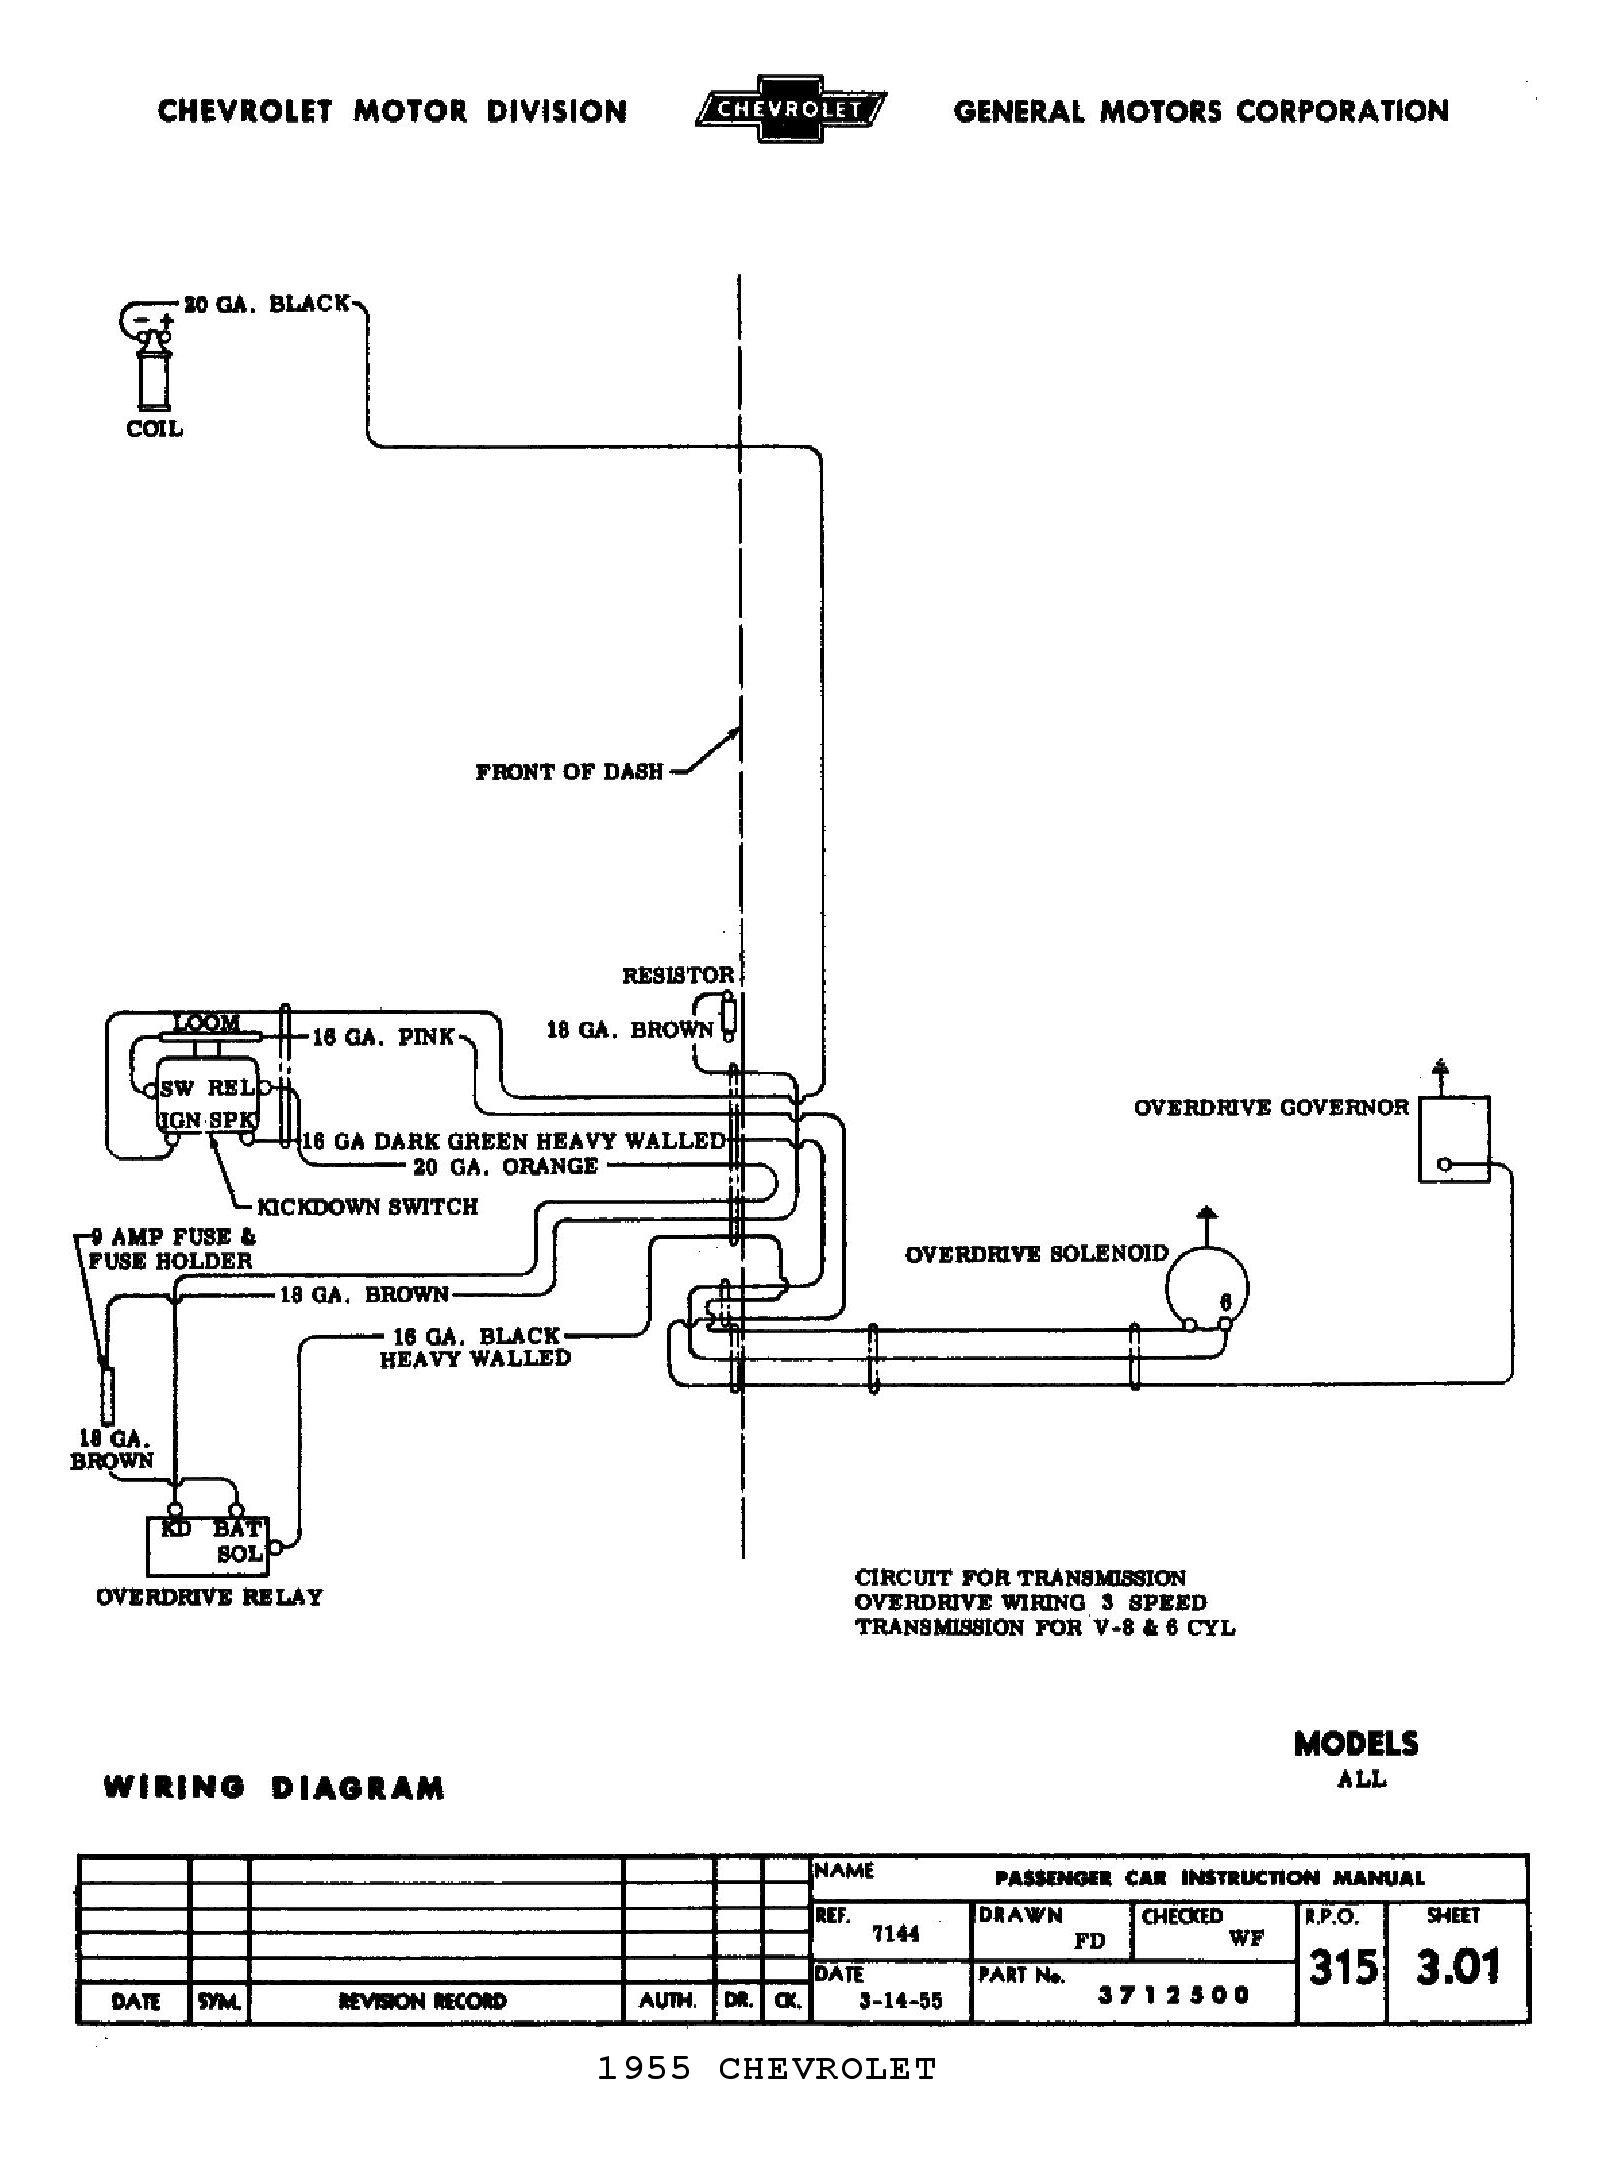 VL_4502] Chevy Ignition Switch Wiring Diagram 55 Chevy Ignition Switch  Diagram Free DiagramMajo Dylit Pead Ogeno Omit Benkeme Mohammedshrine Librar Wiring 101